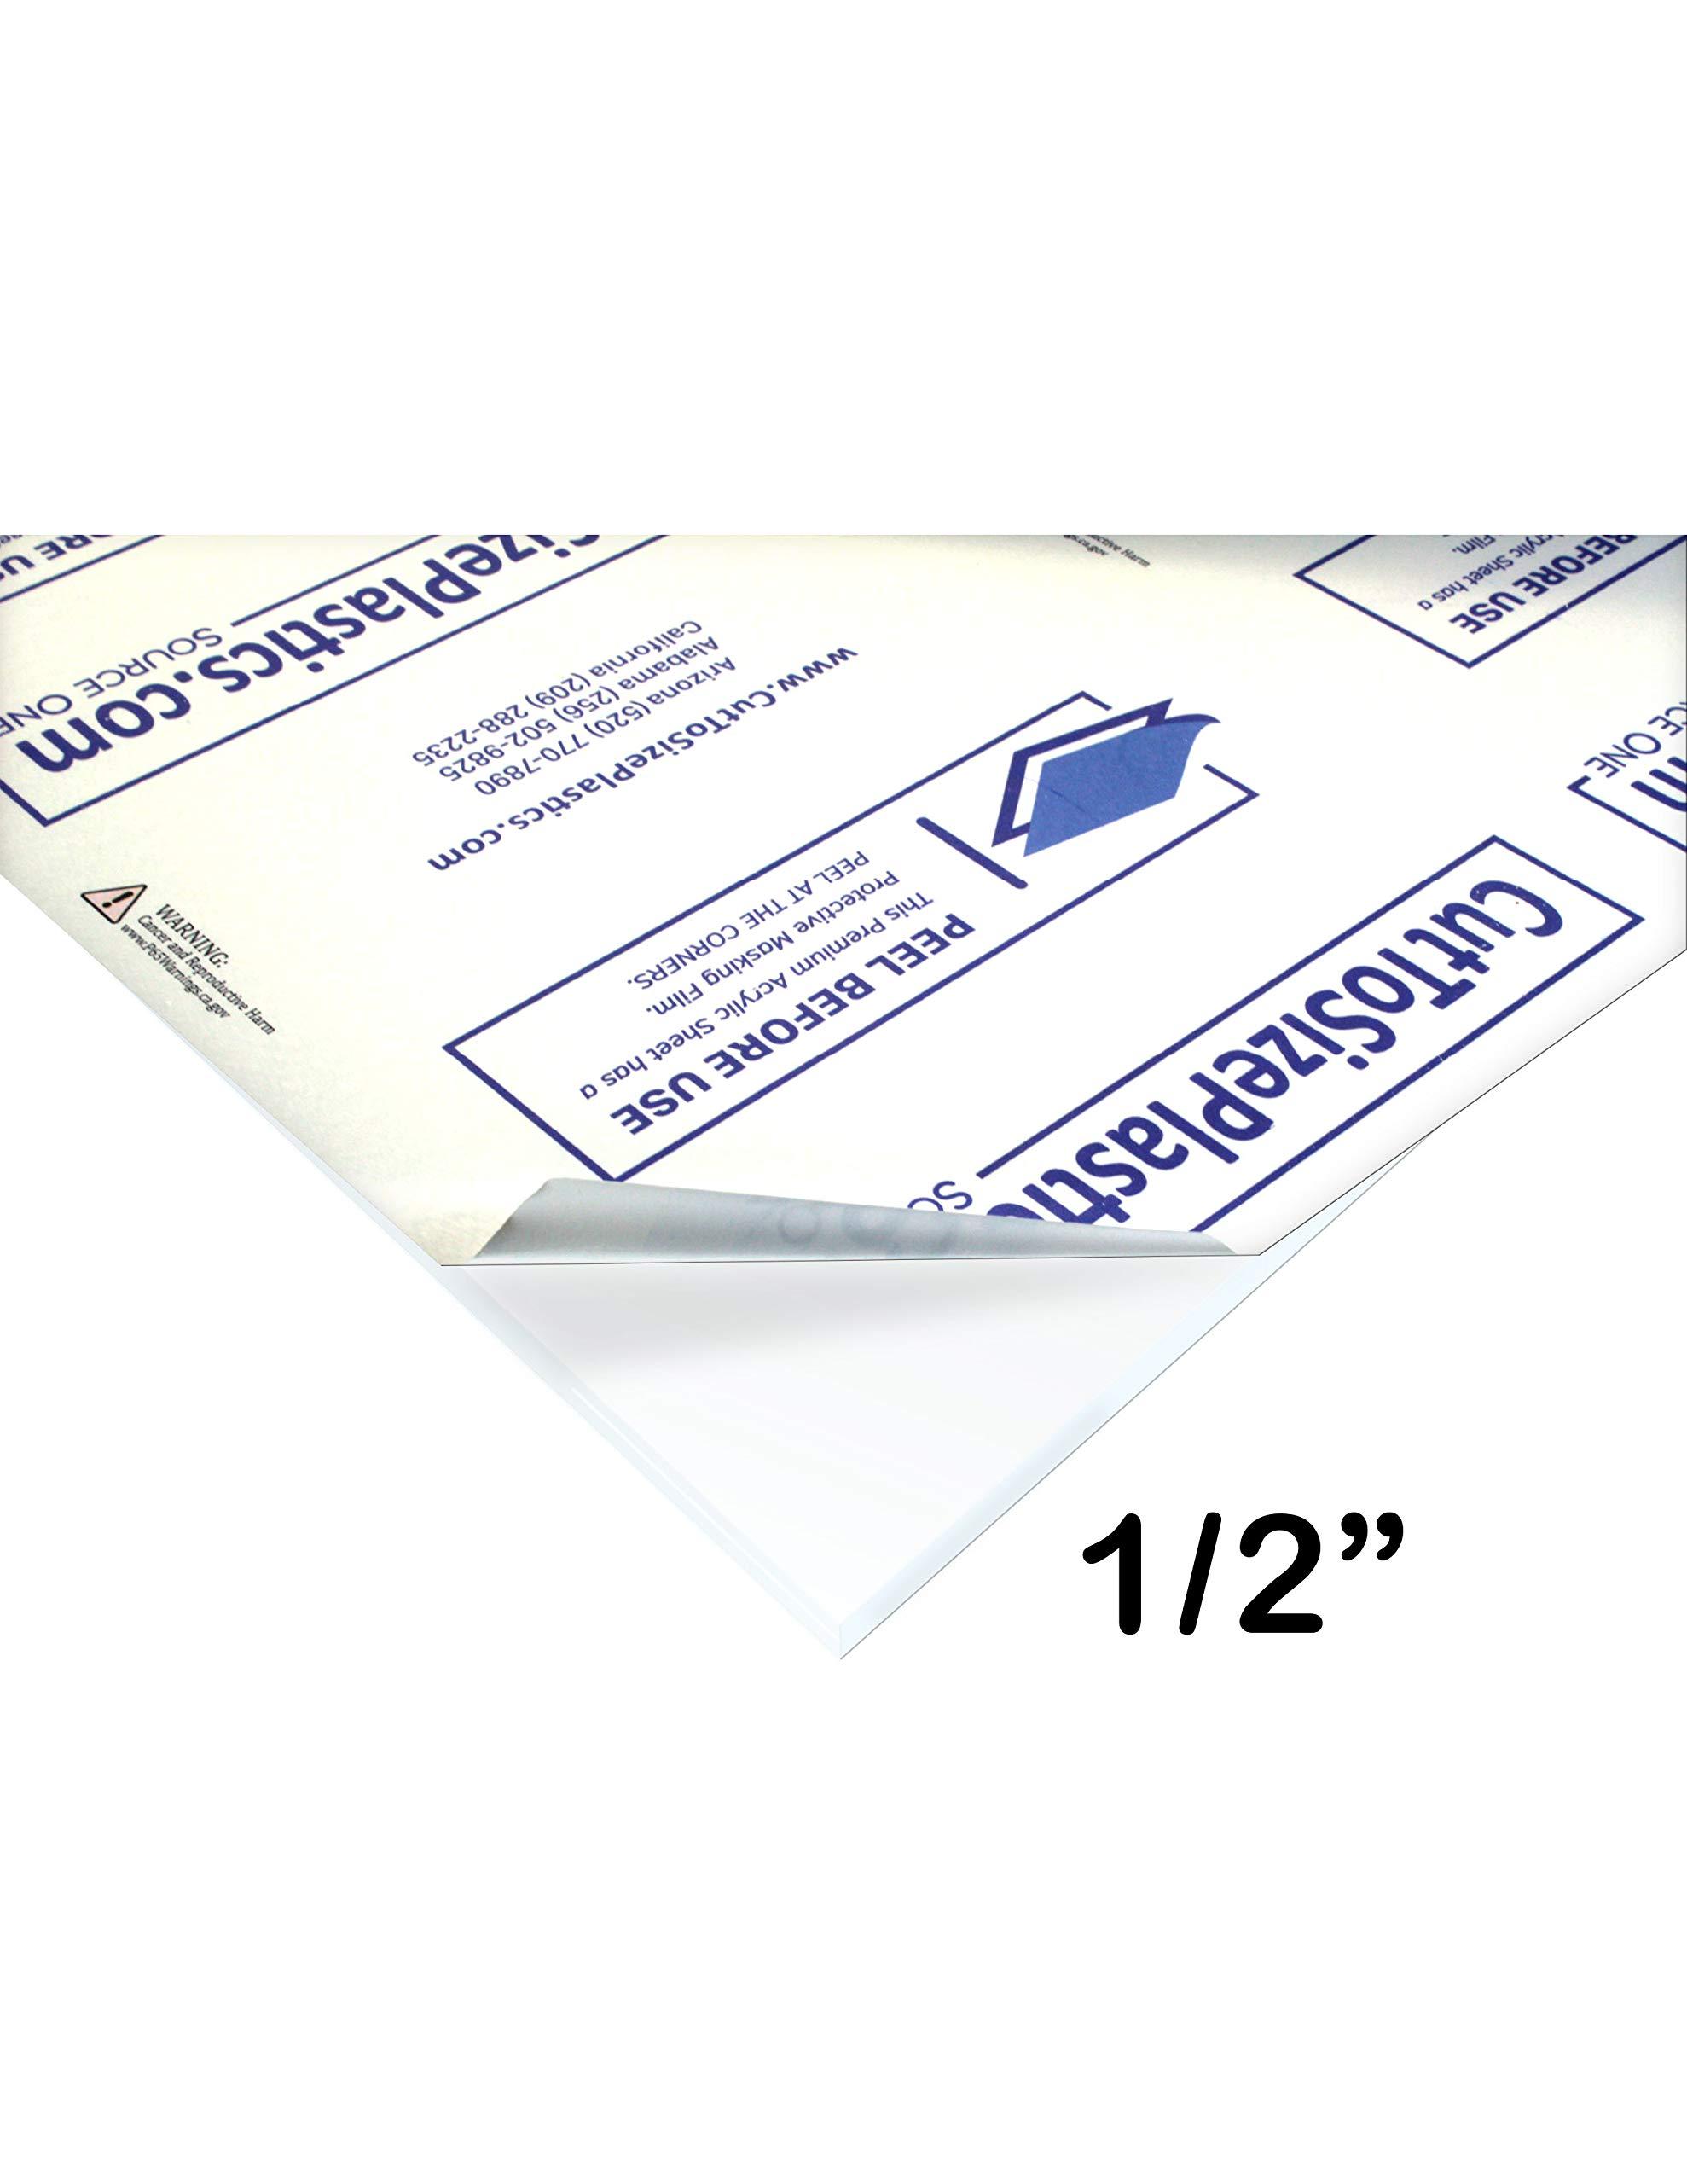 SourceOne 1 Sheet - 1/2'' Clear Acrylic Plexiglass Sheet HEAVY DUTY (24'' X 24'') by SOURCEONE.ORG